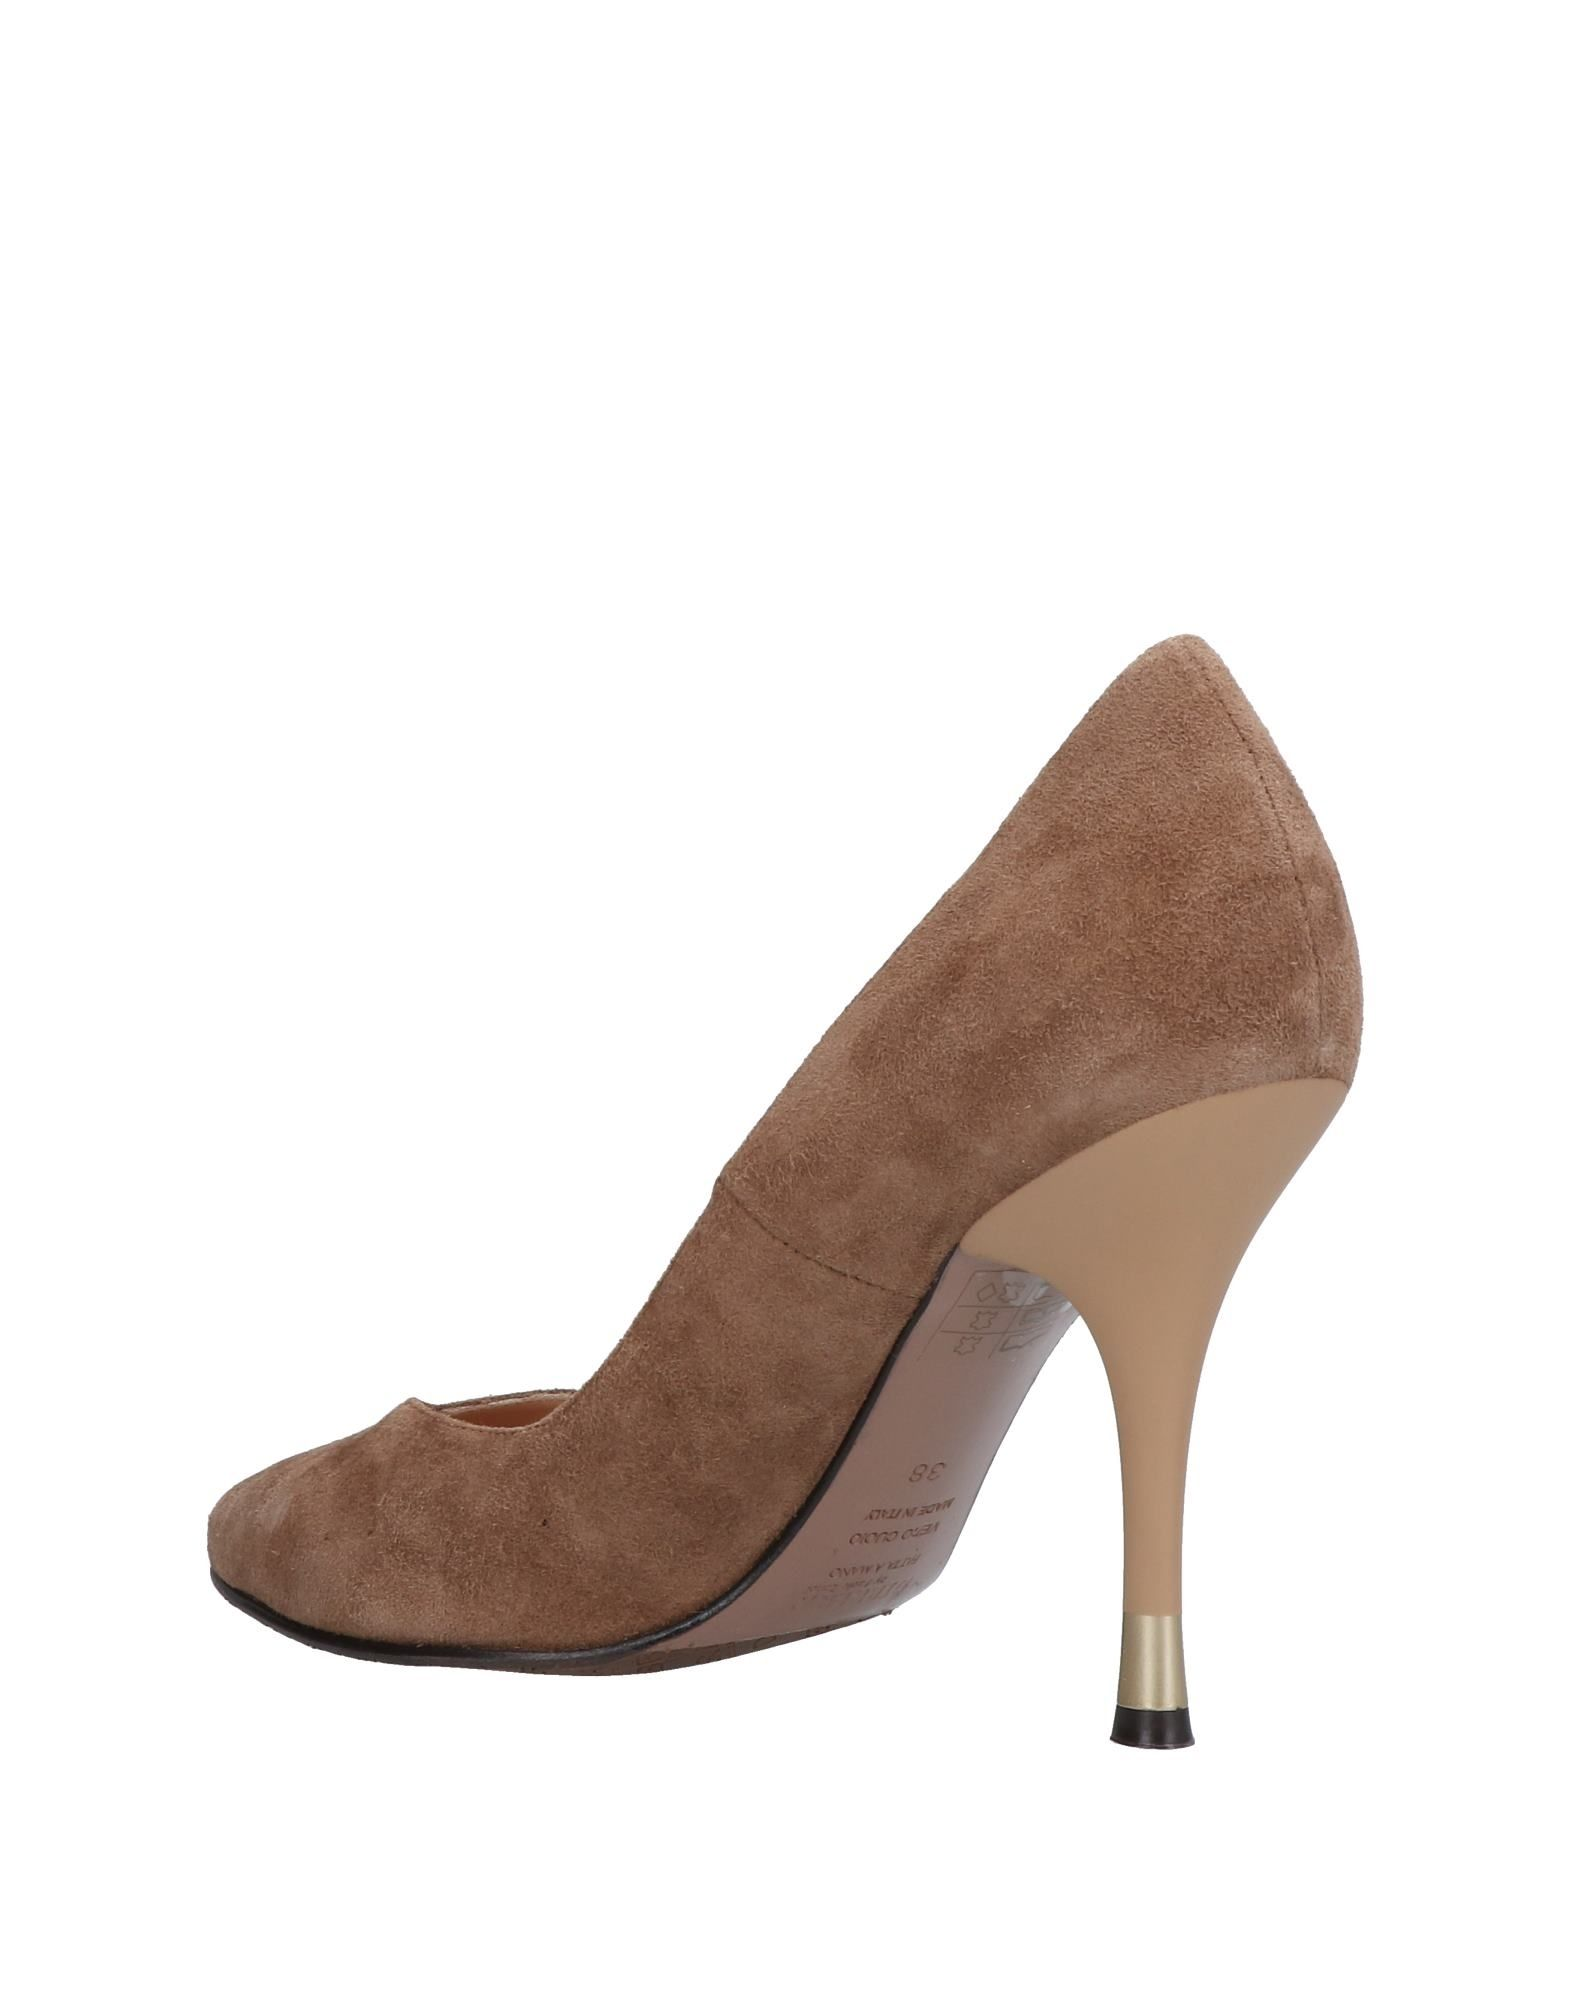 Stilvolle billige Schuhe Damen Dibrera By Paolo Zanoli Pumps Damen Schuhe  11447021AW f2d1ed